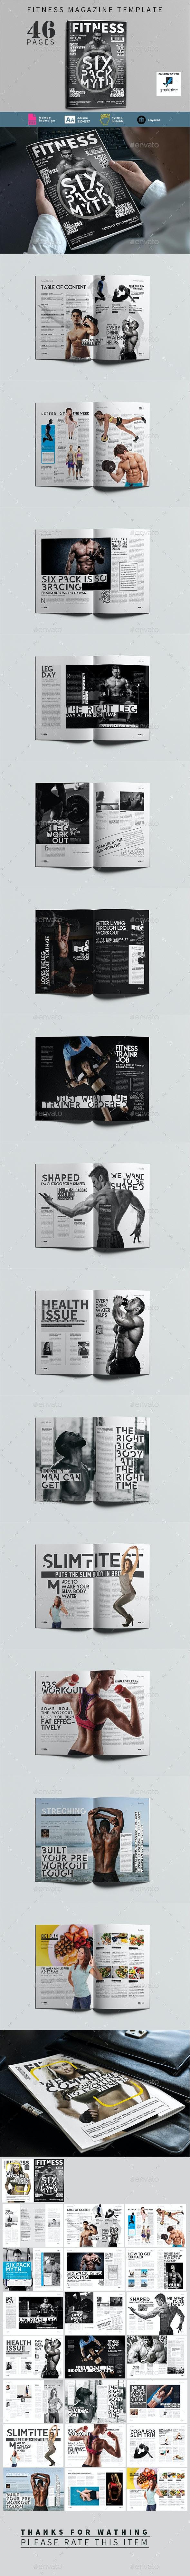 Fitness Magazine - Magazines Print Templates